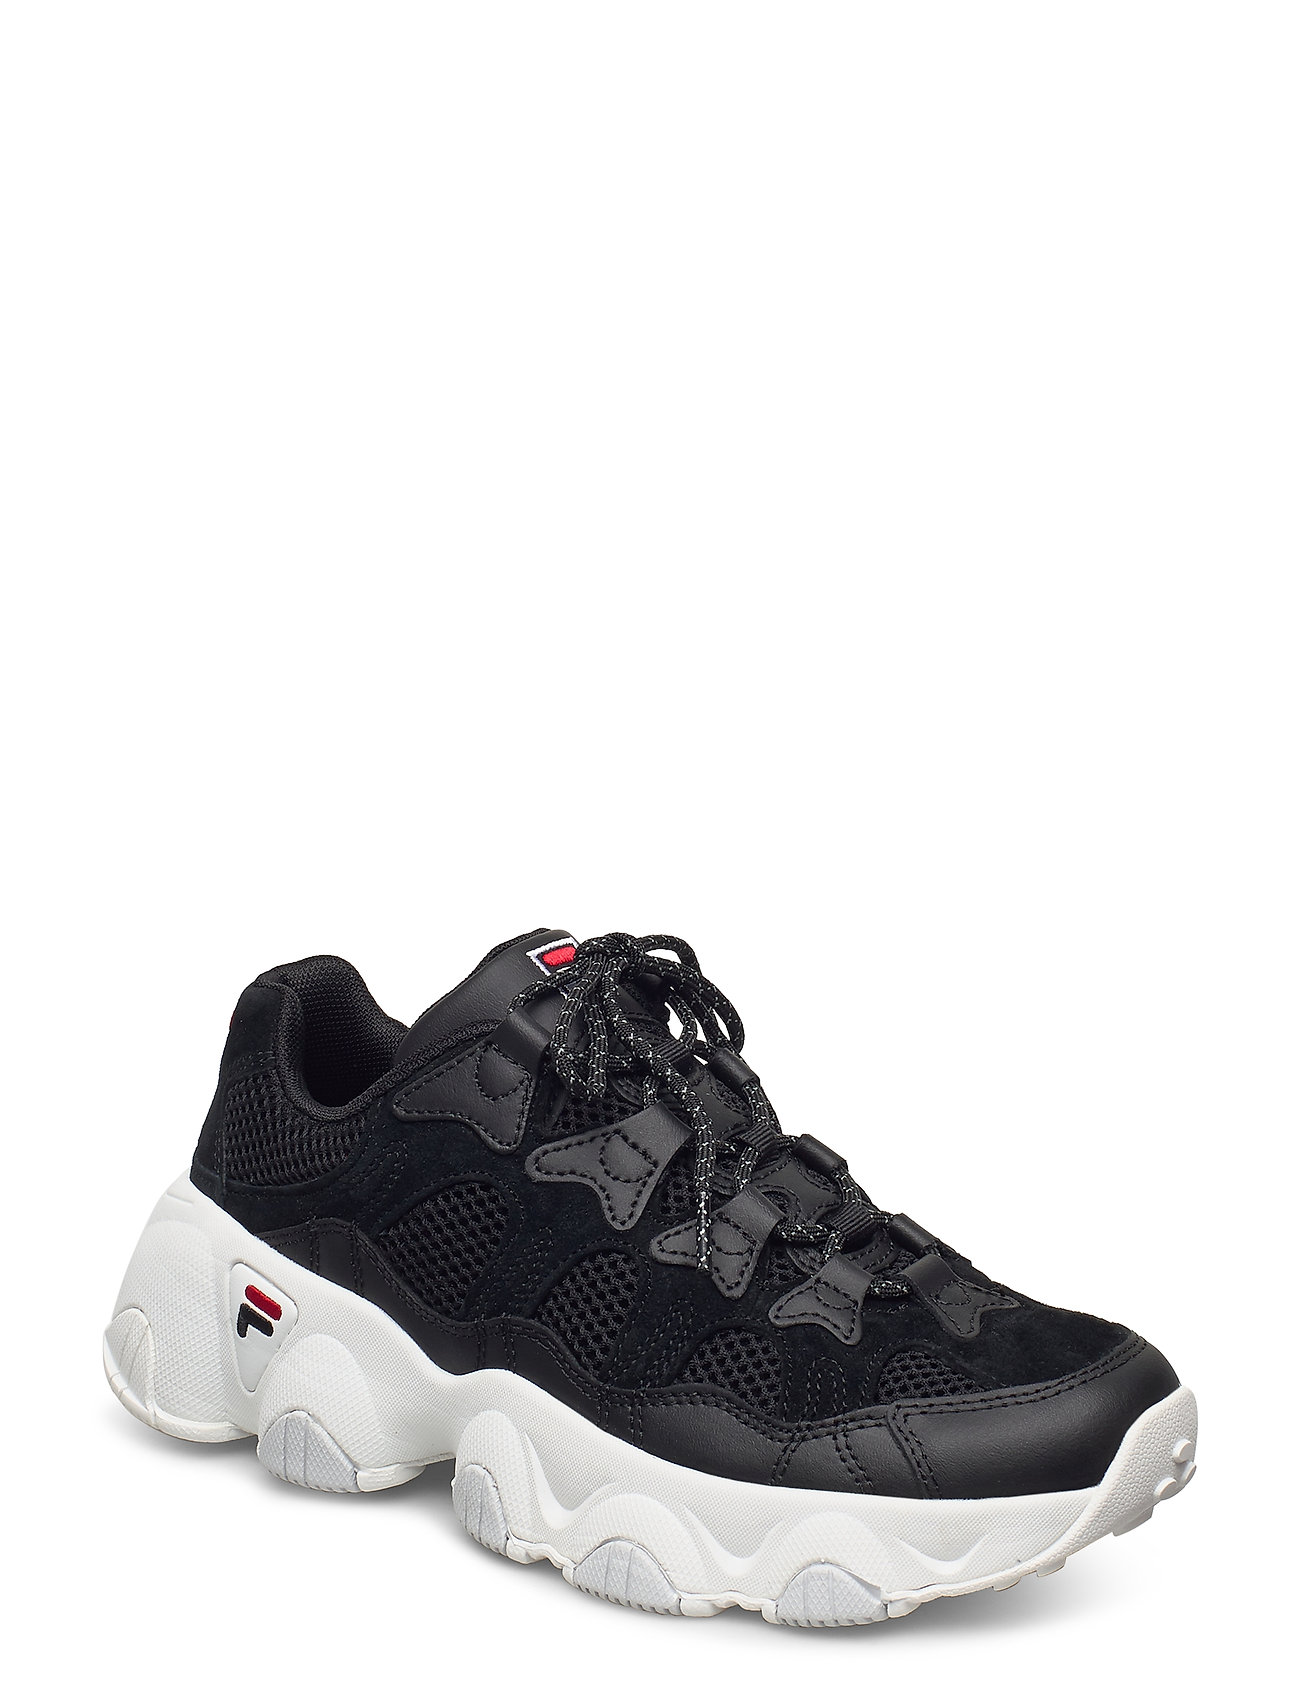 Image of Jagger Wmn Low-top Sneakers Sort FILA (3453136643)